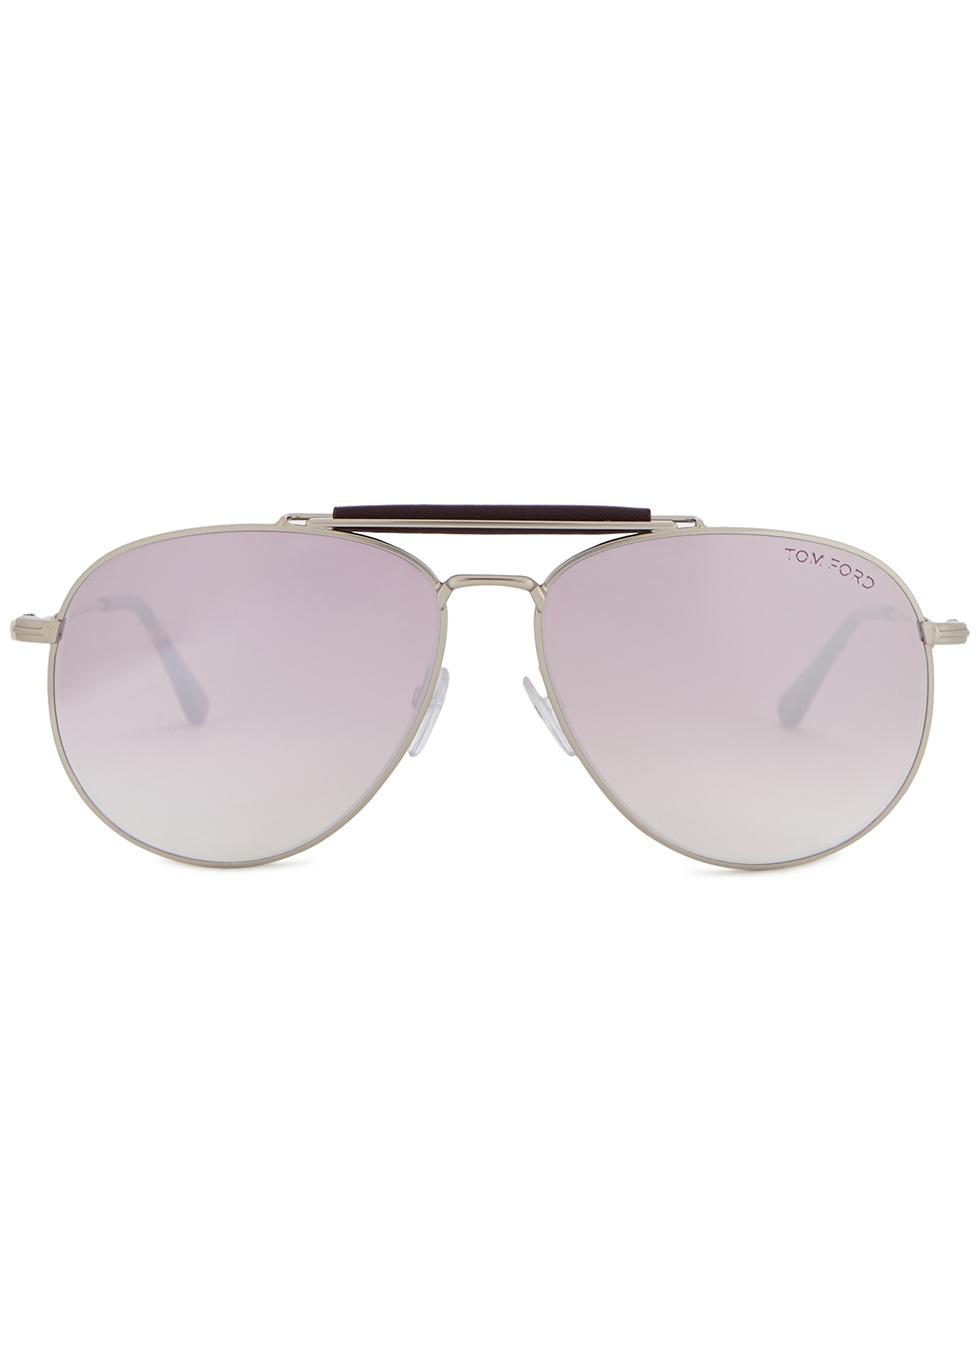 Sean aviator-style sunglasses - Tom Ford Eyewear